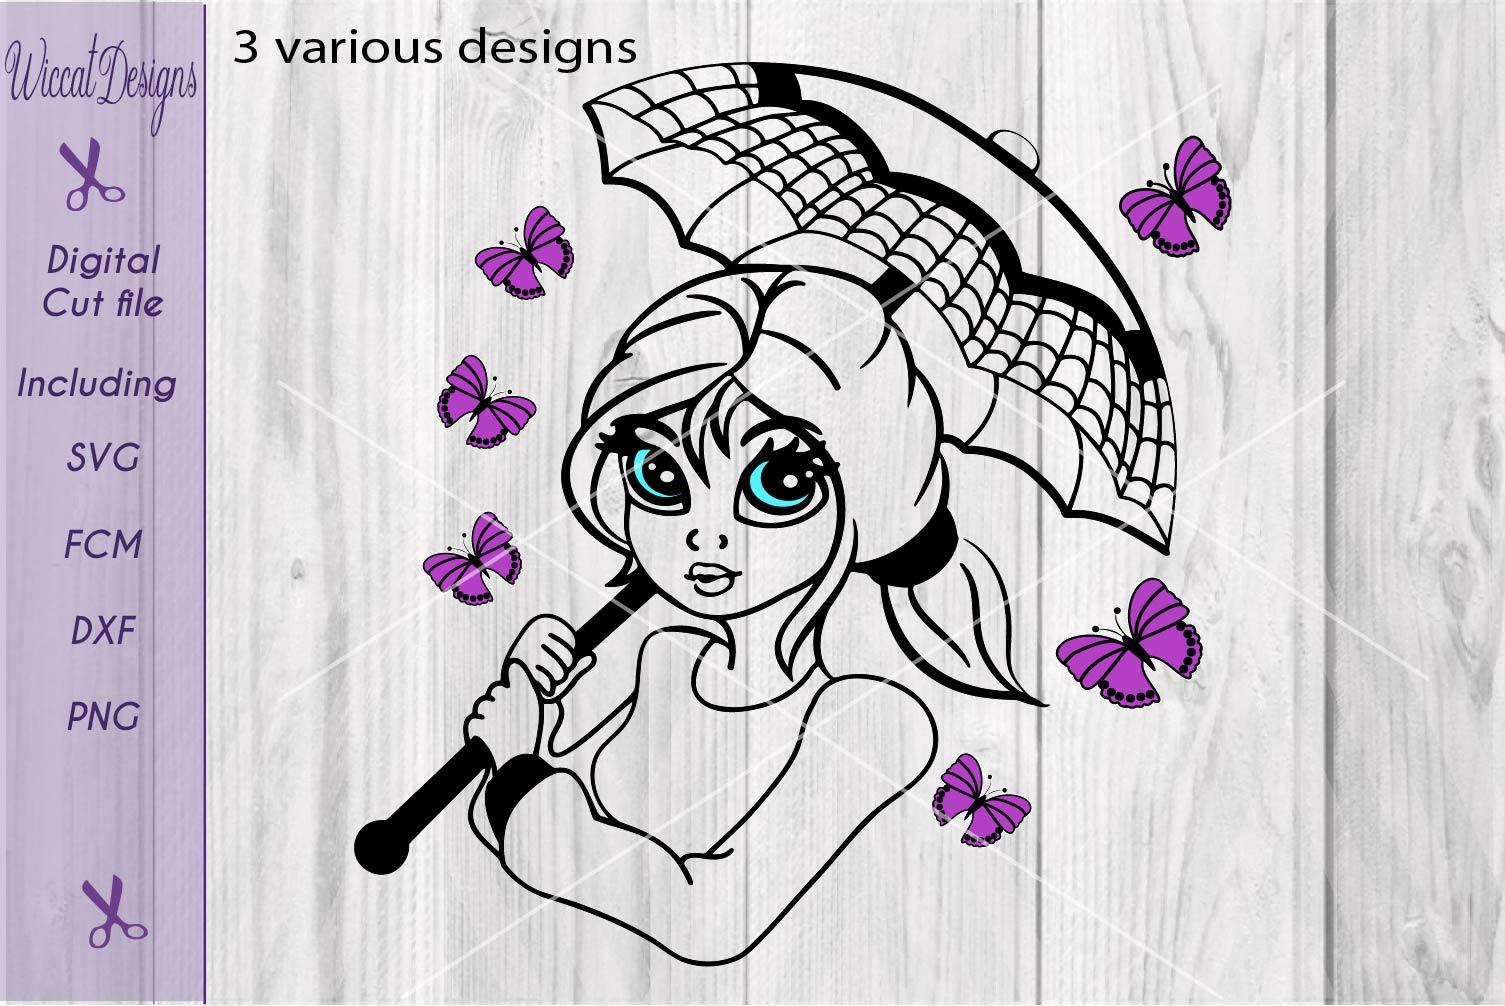 Butterfly girl svg, Umbrella girl svg, Girl face svg, summer girl svg example image 3